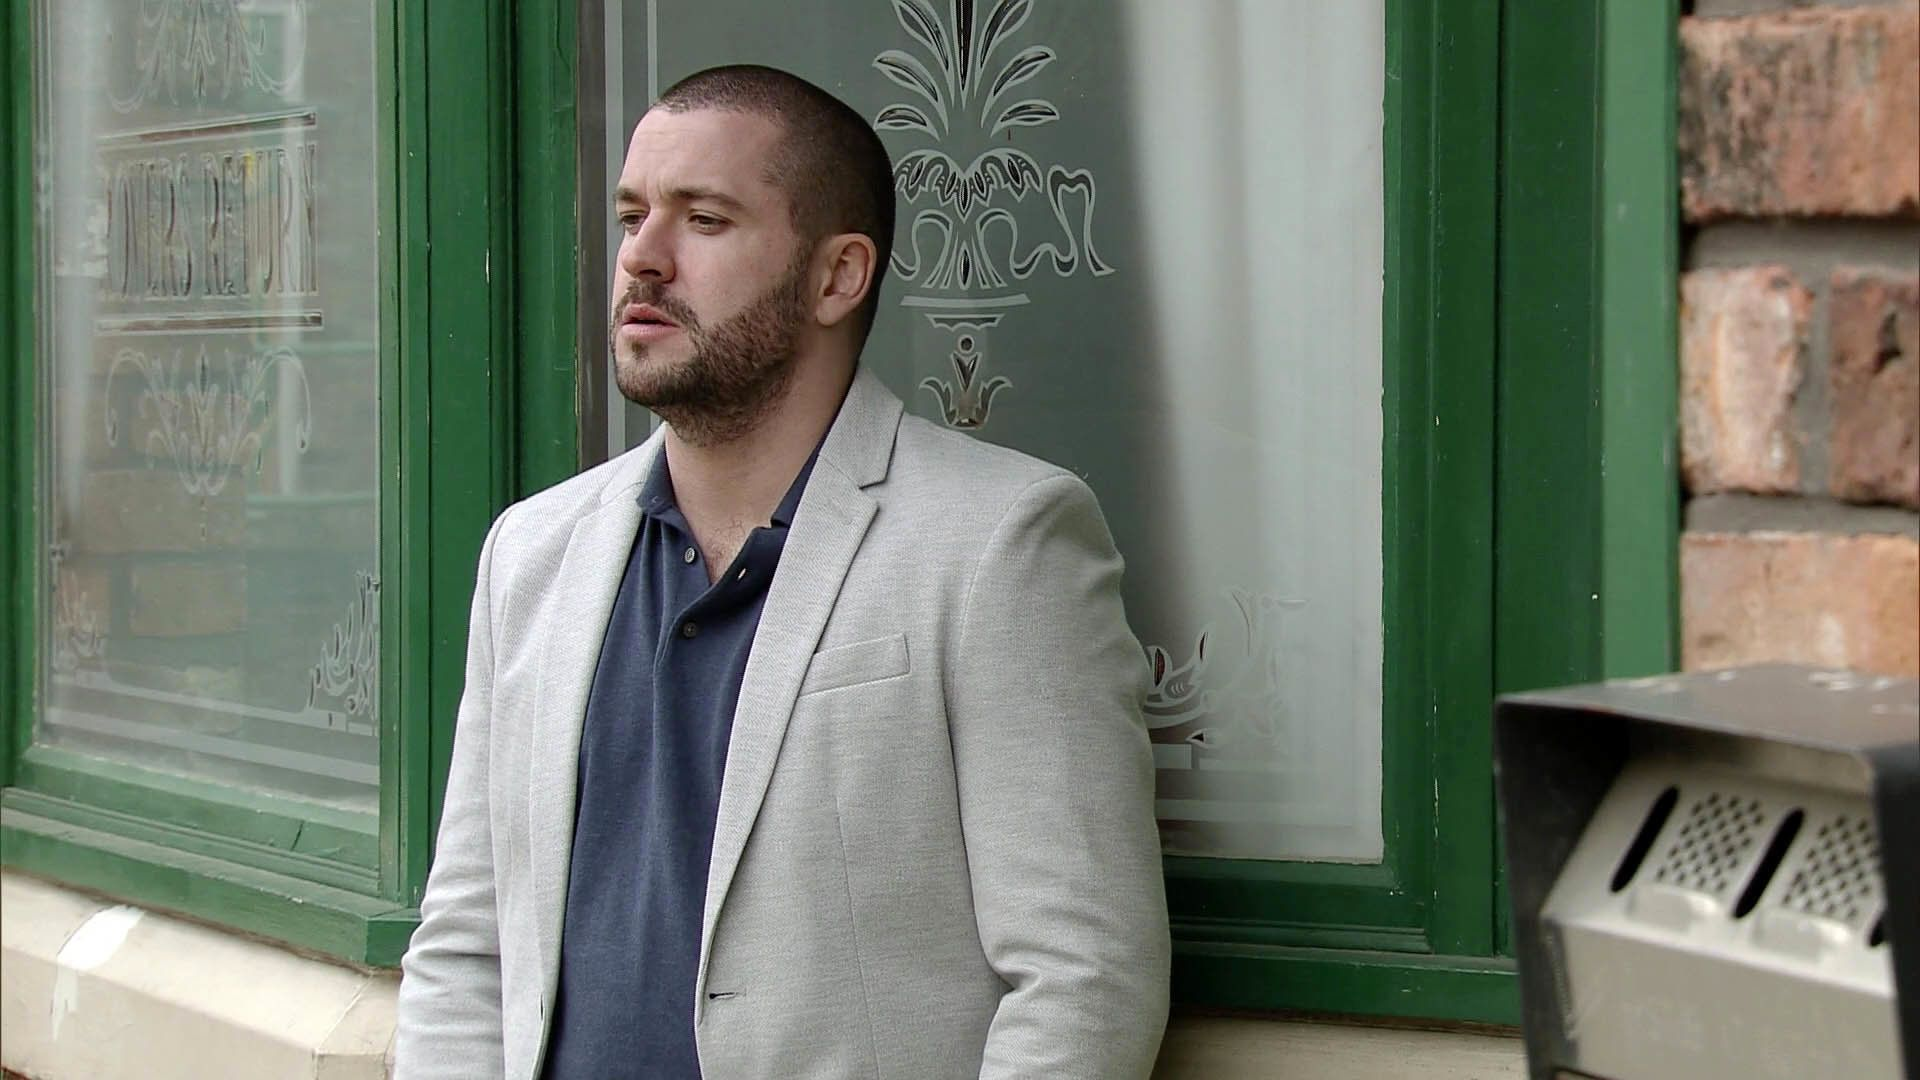 'Coronation Street' Announces Male Suicide Storyline For Shayne Ward